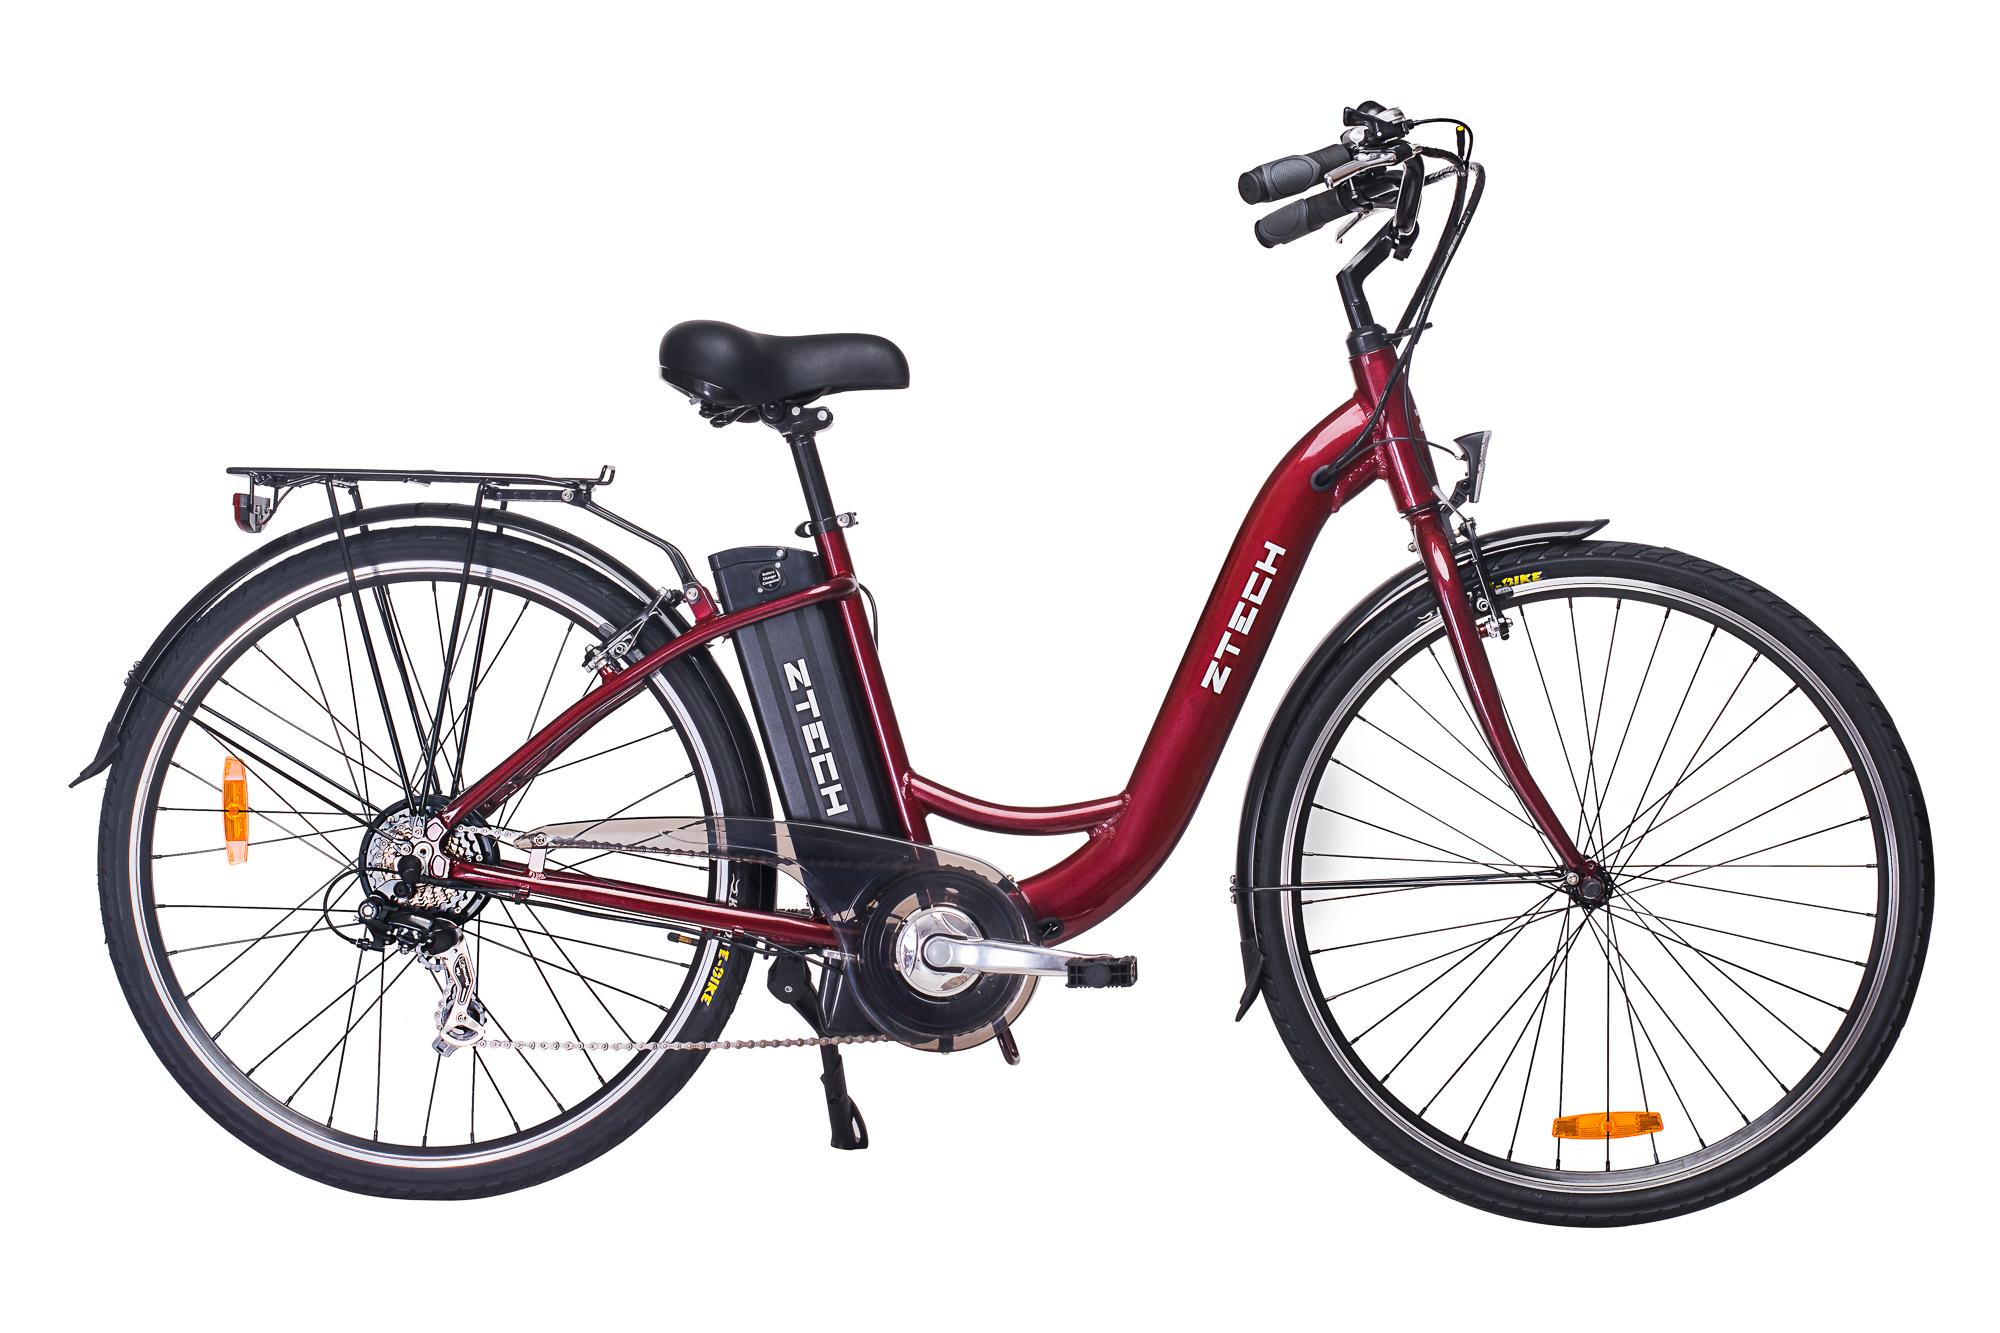 Bicicleta electrica Ztech ZT-13 Retro 2.0